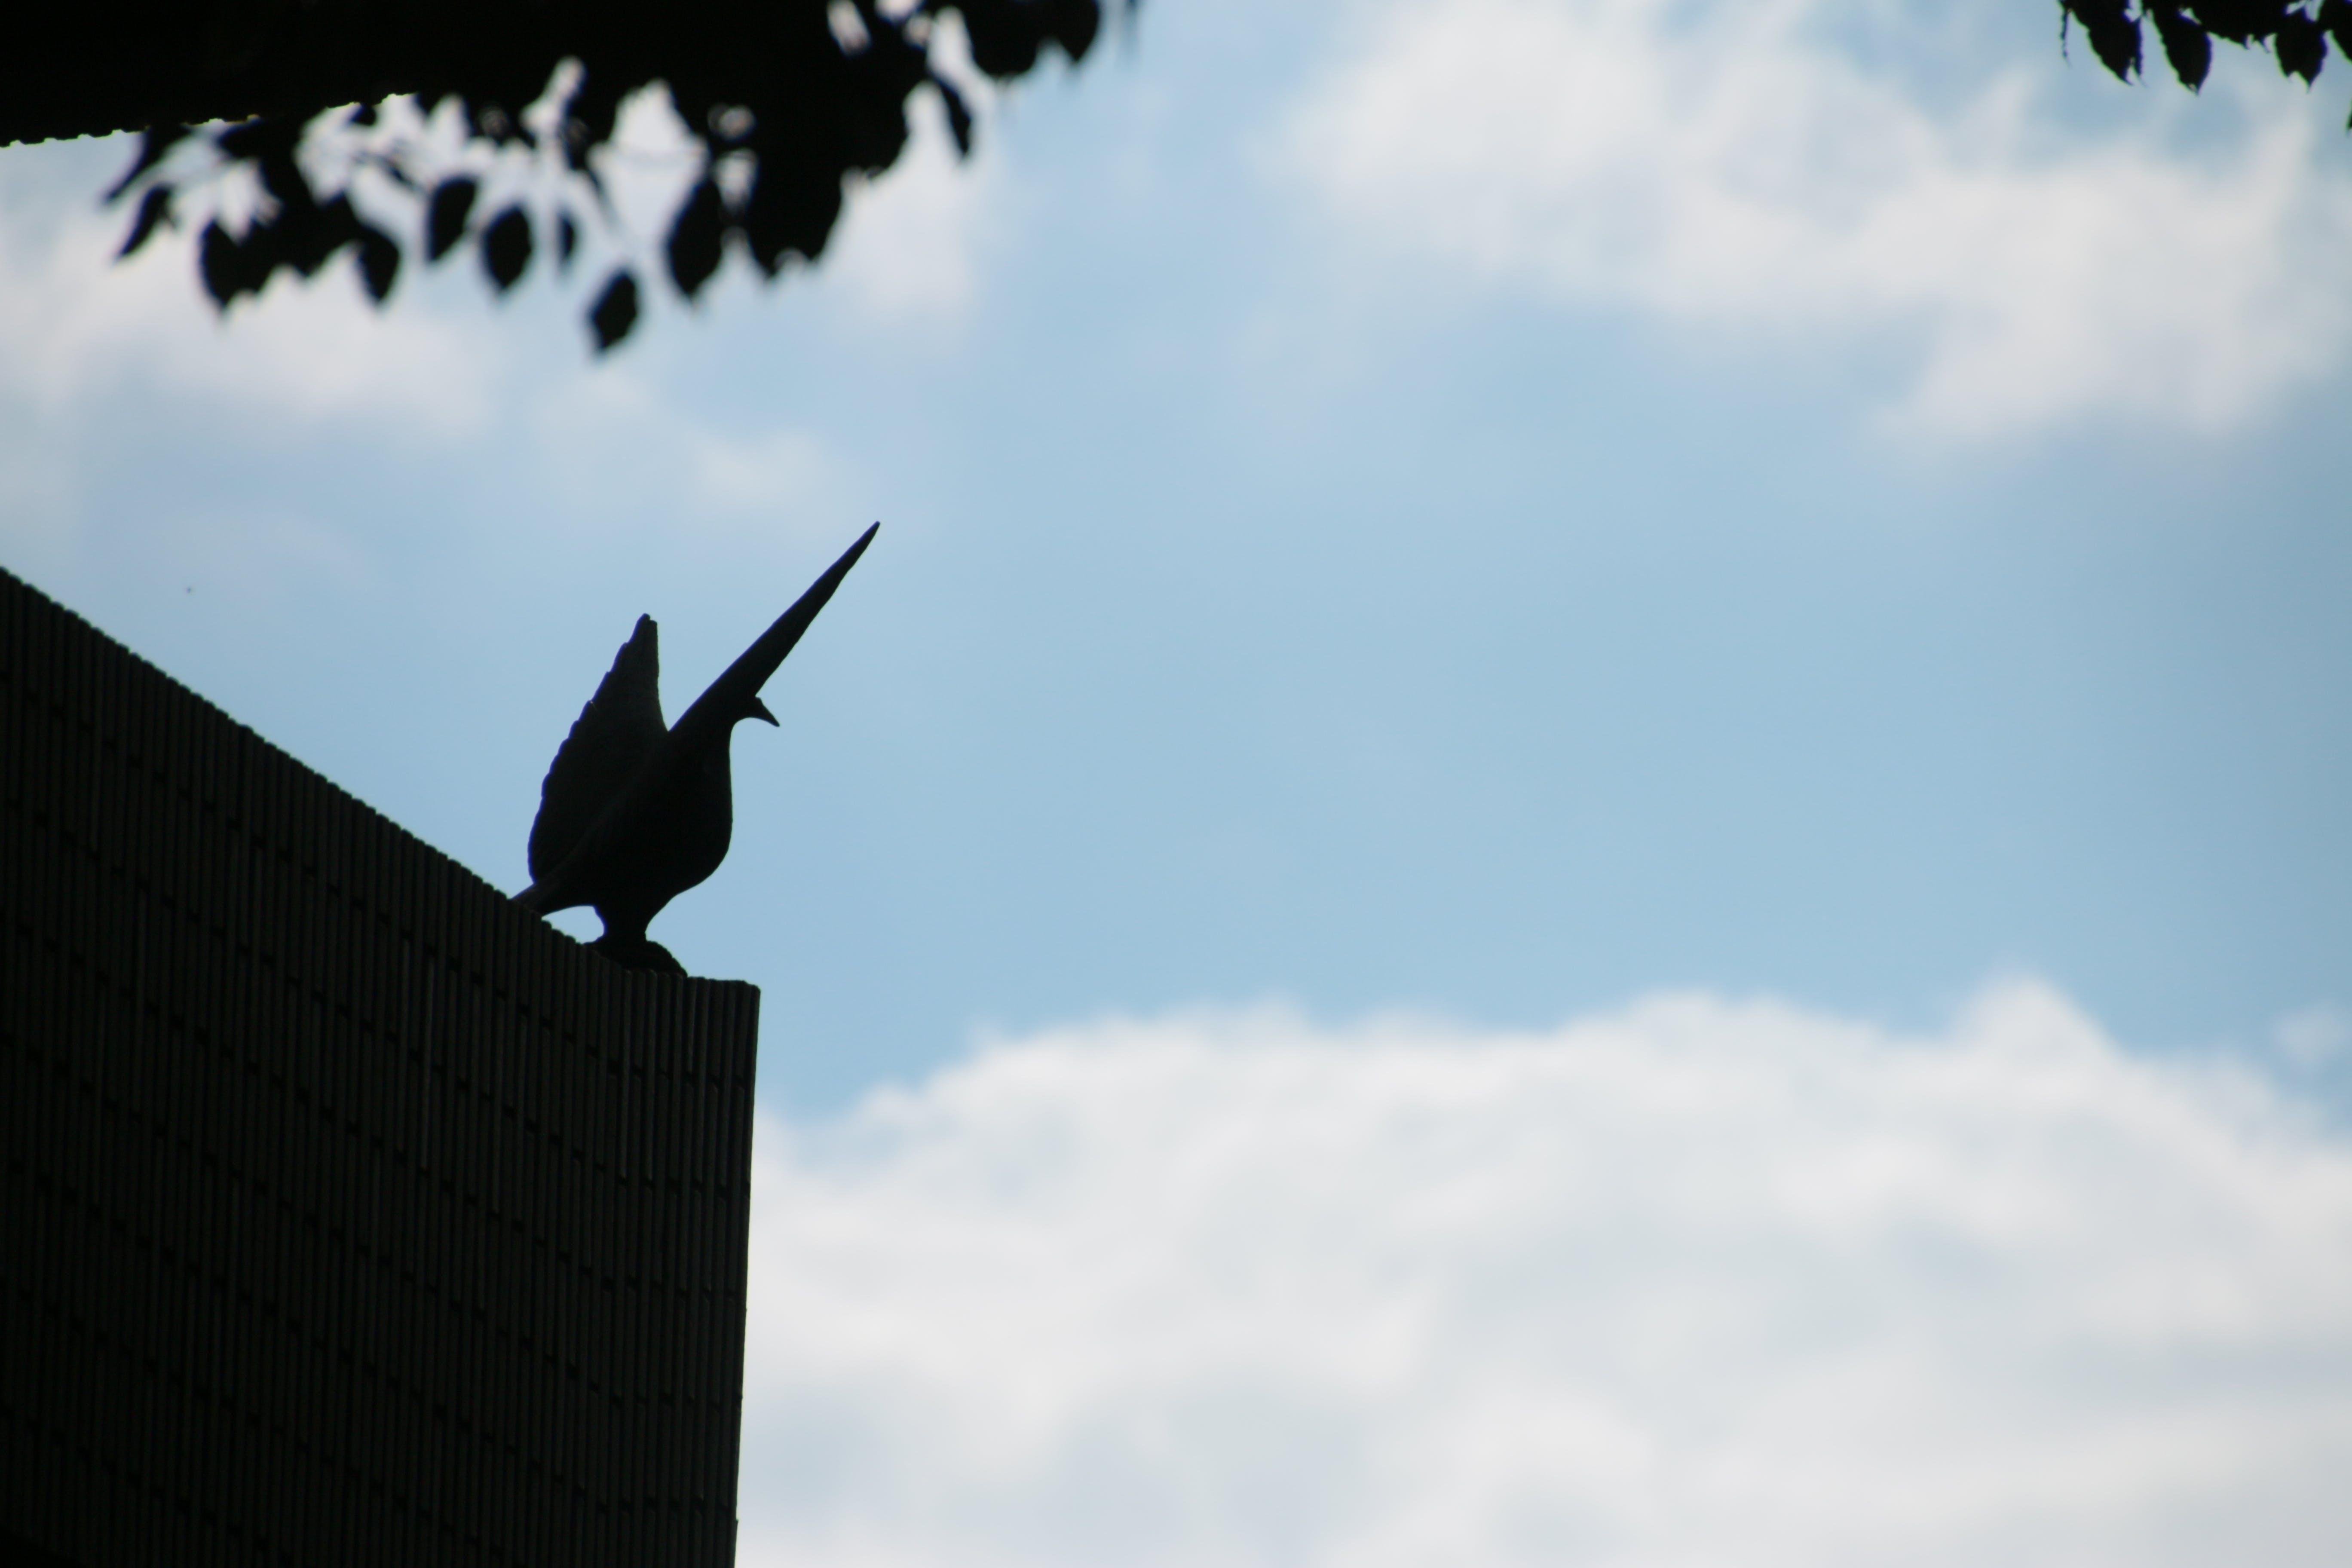 Free stock photo of bird, silhouette, statue